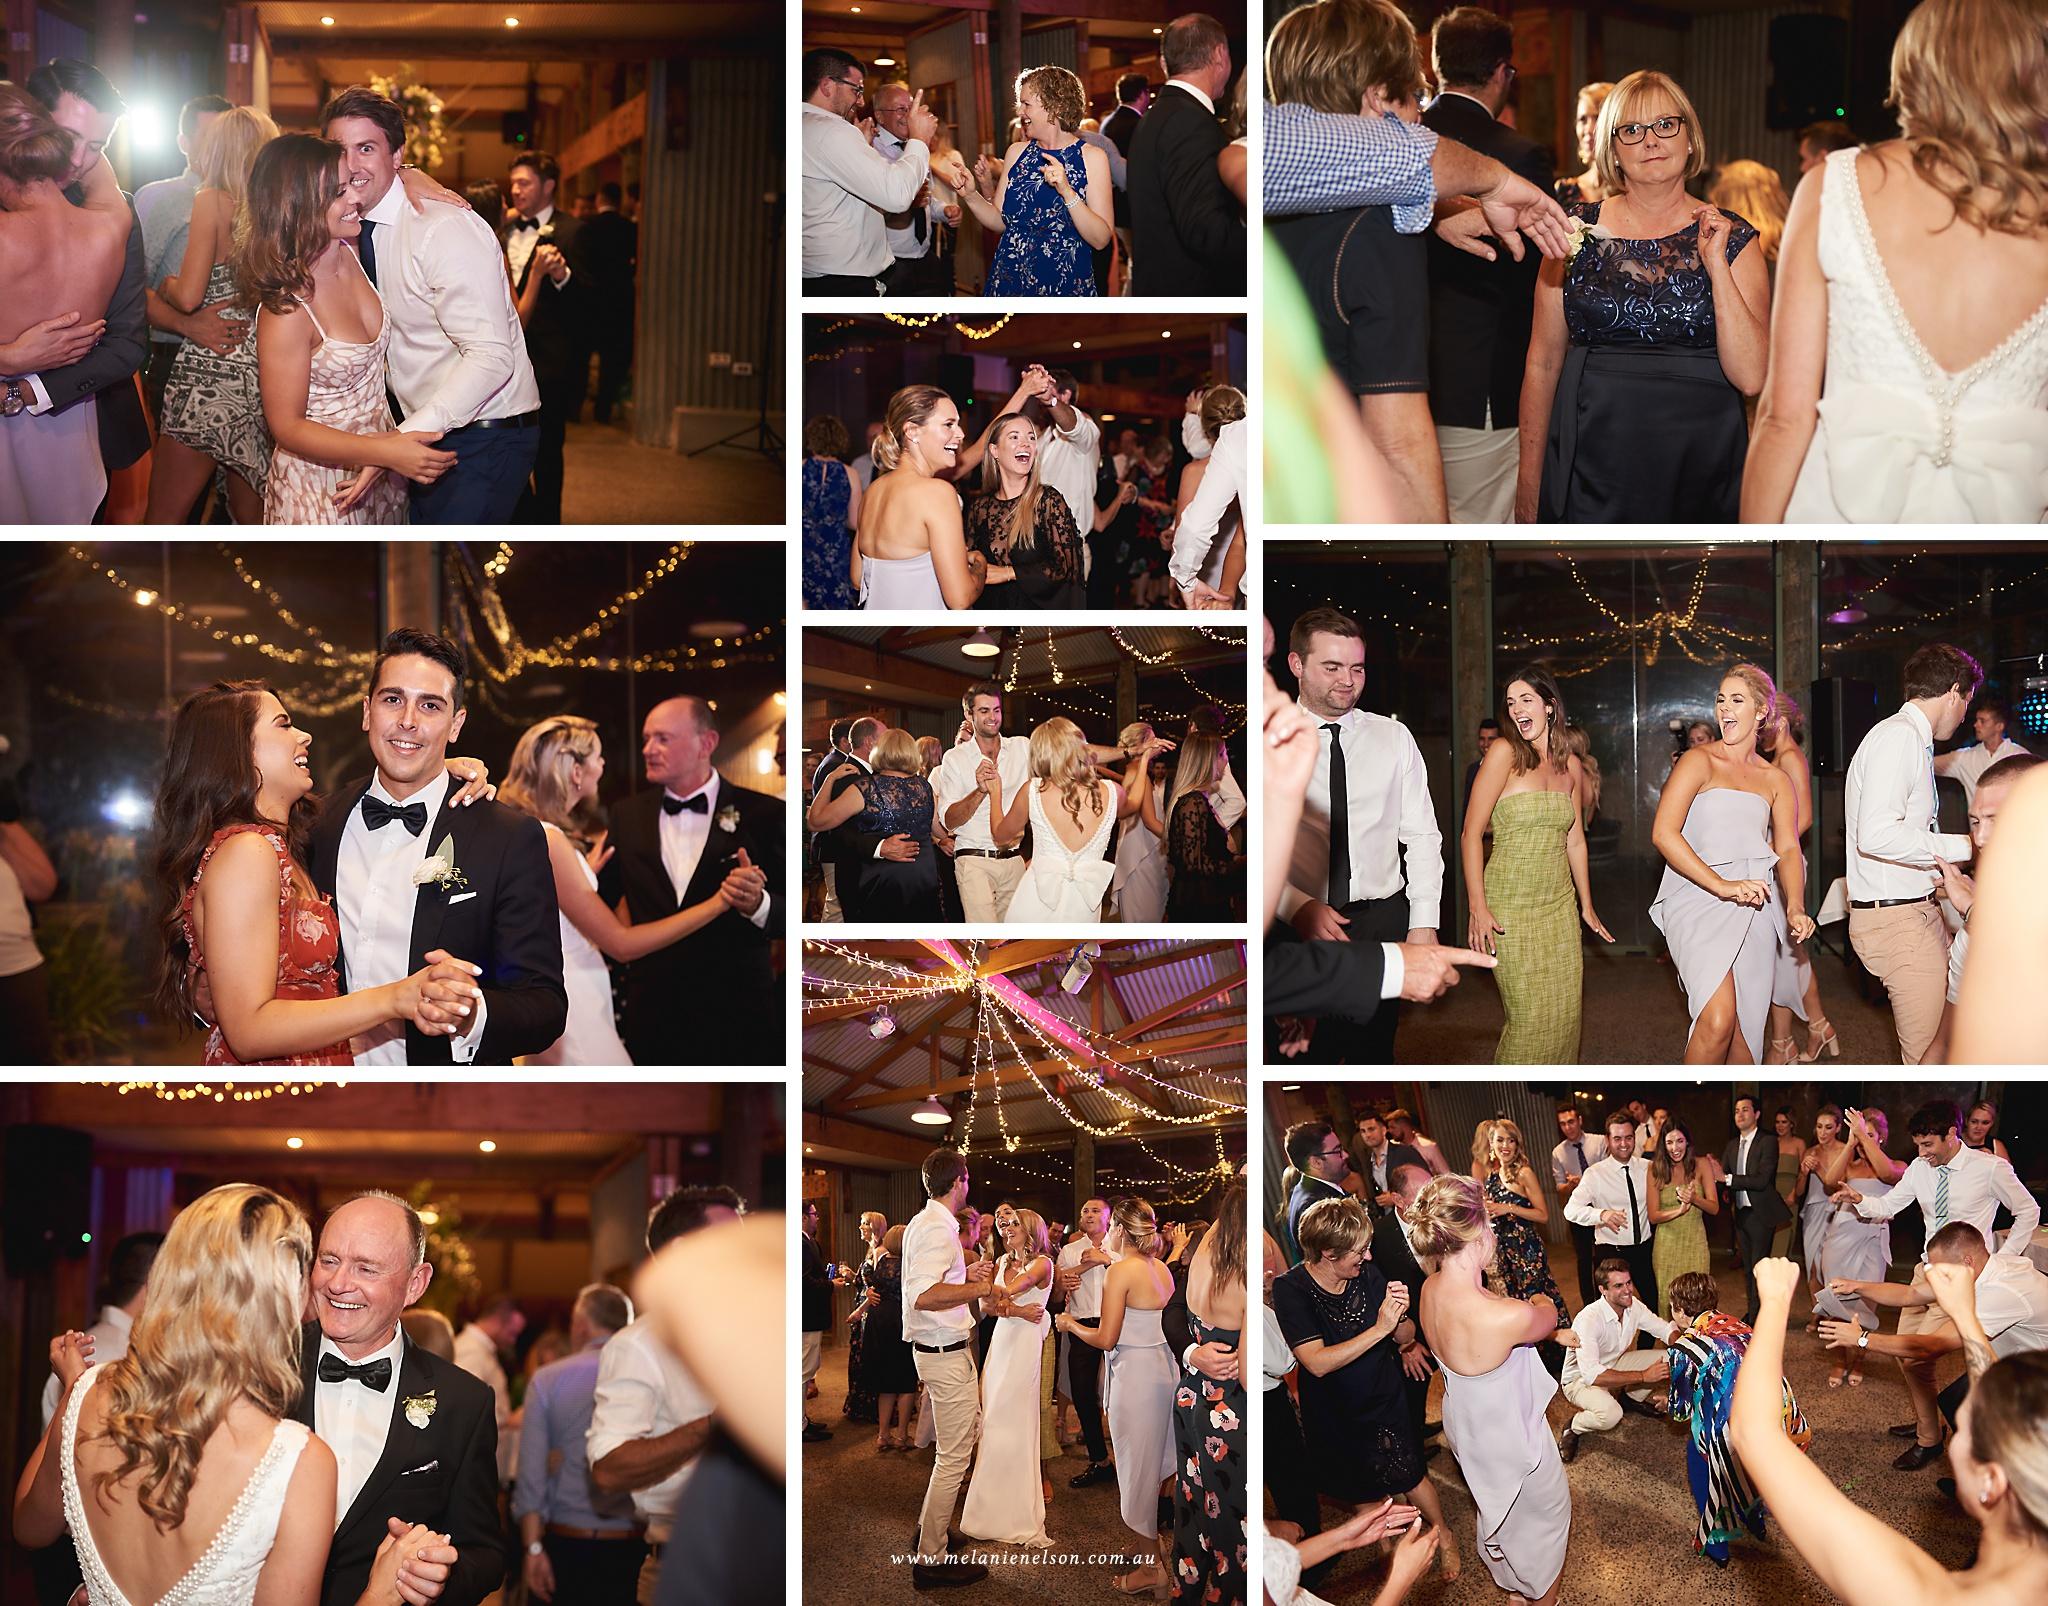 longview_vineyard_wedding_0095.jpg